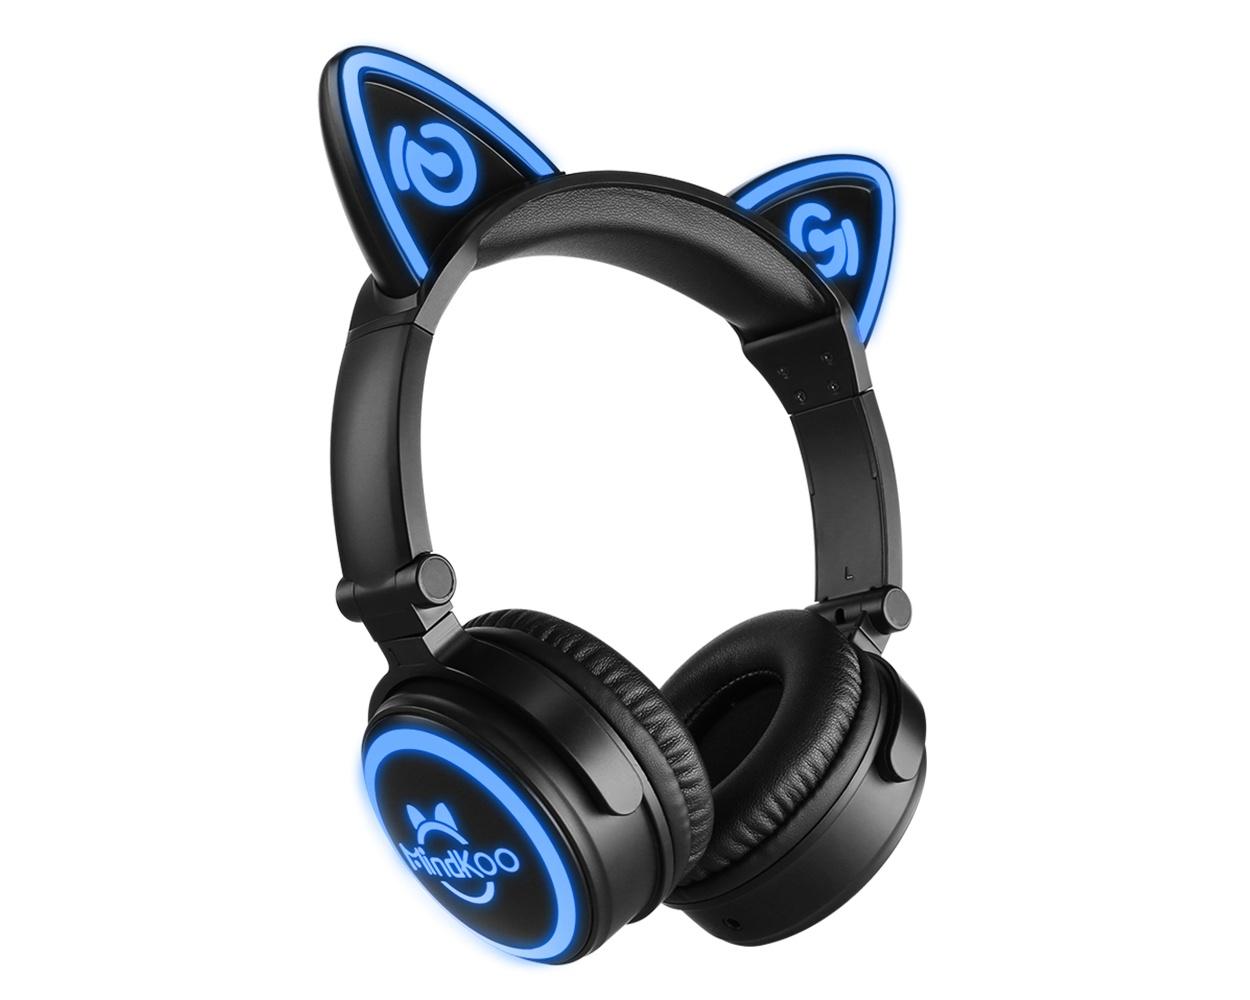 mindkoo unicat cat ear bluetooth headphones are a fun and. Black Bedroom Furniture Sets. Home Design Ideas